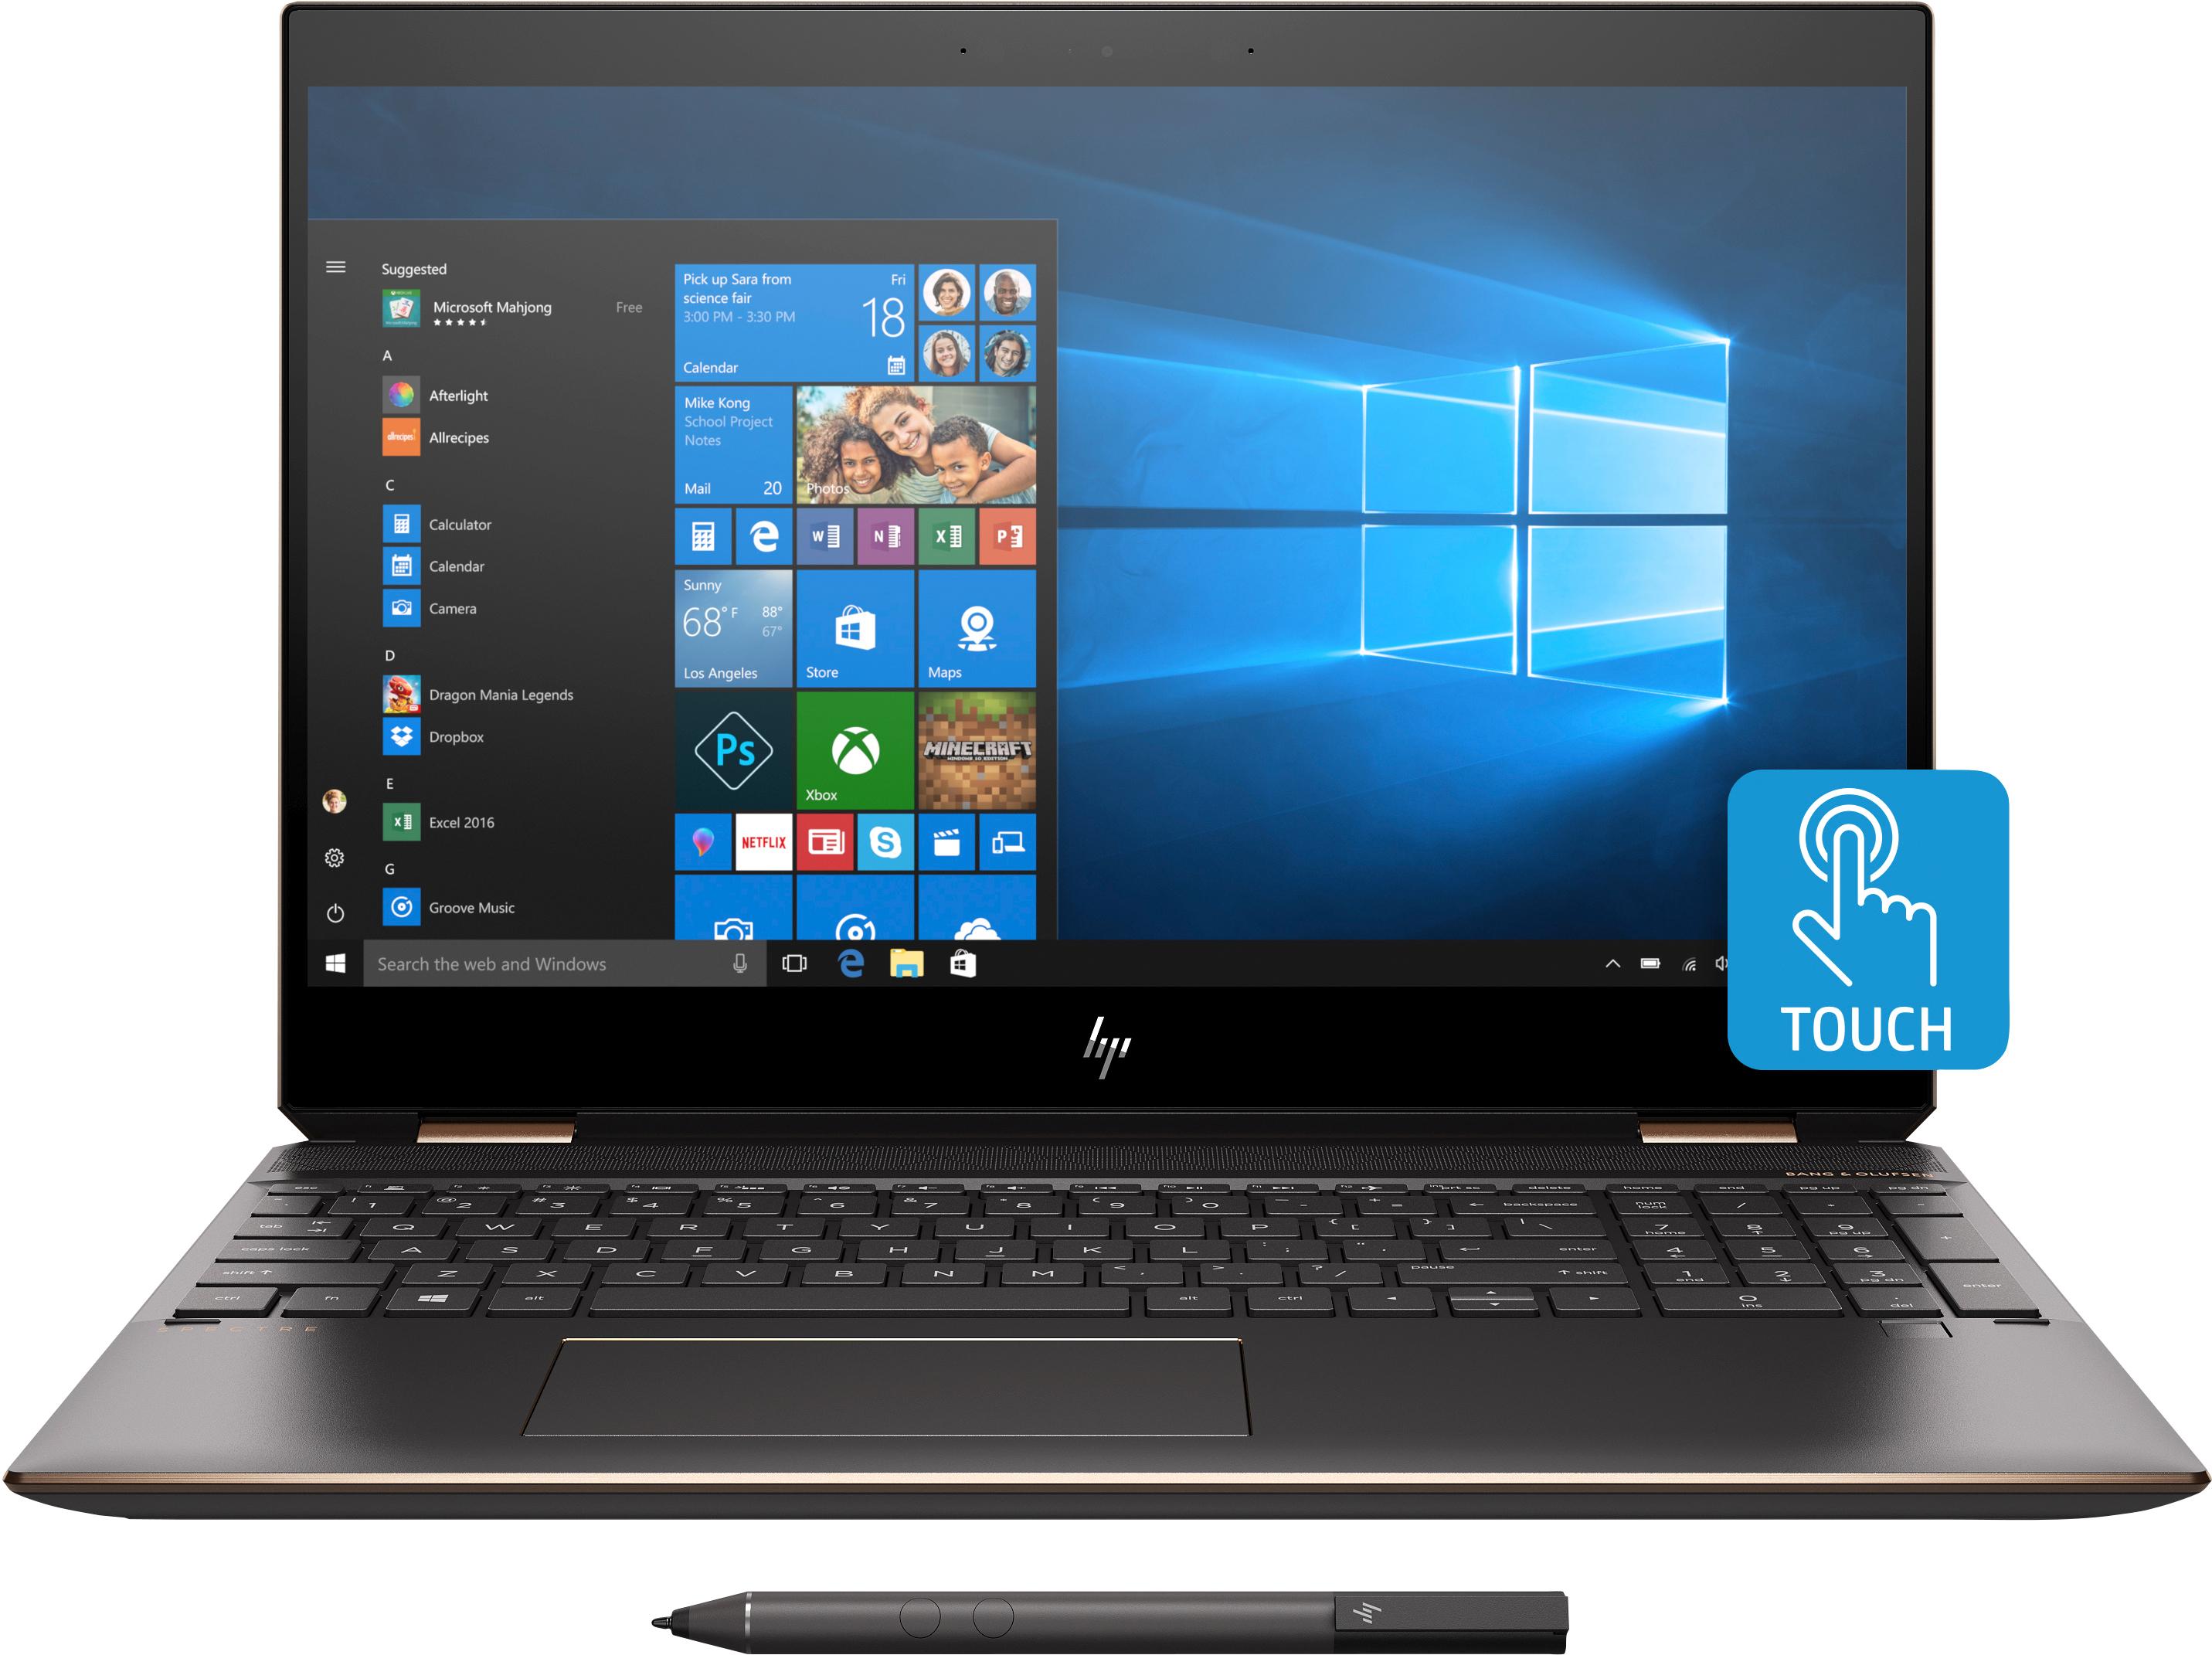 "HP Spectre x360 15-df0400nd Grigio, Argento Ibrido (2 in 1) 39,6 cm (15.6"") 1920 x 1080 Pixel Touch screen 2,2 GHz Intel® CoreT i7 di ottava generazione i7-8750H"